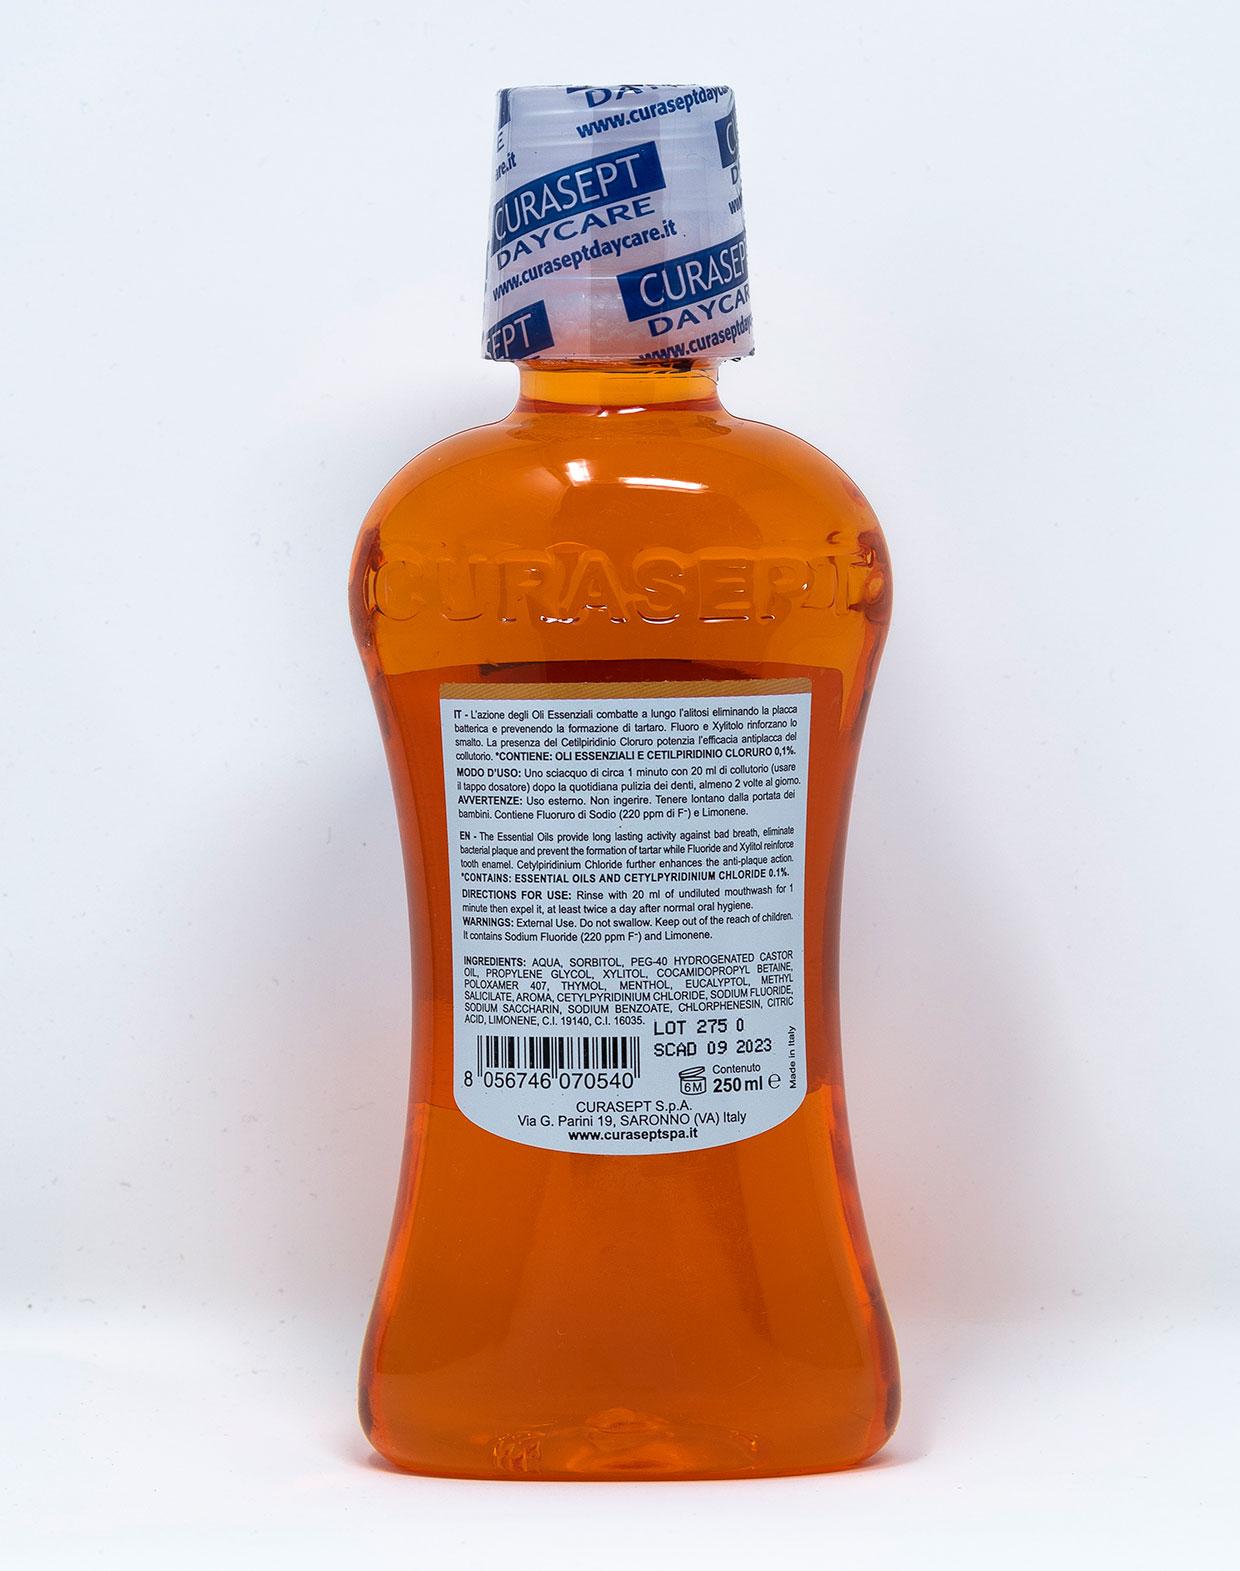 Curasept Collutorio Daycare Protection Plus Agrumi - 250 ml